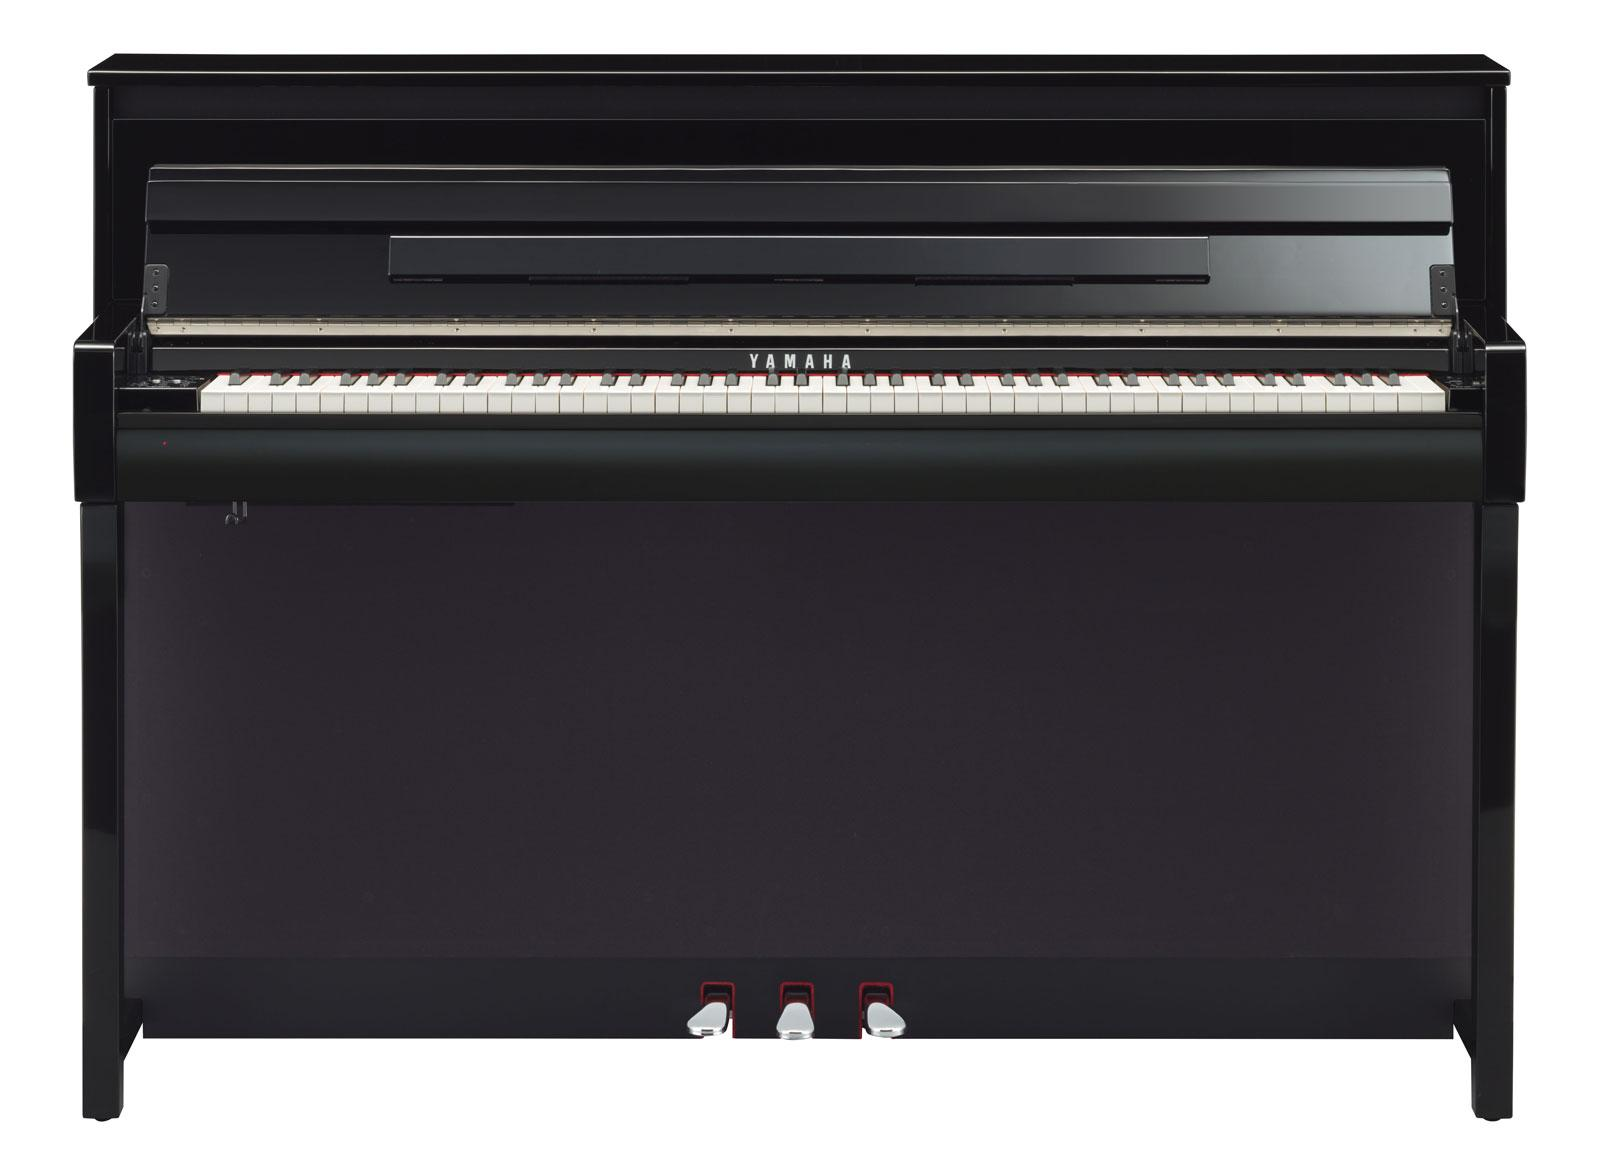 yamaha clp 685 pe digitalpiano schwarz hochglanz. Black Bedroom Furniture Sets. Home Design Ideas